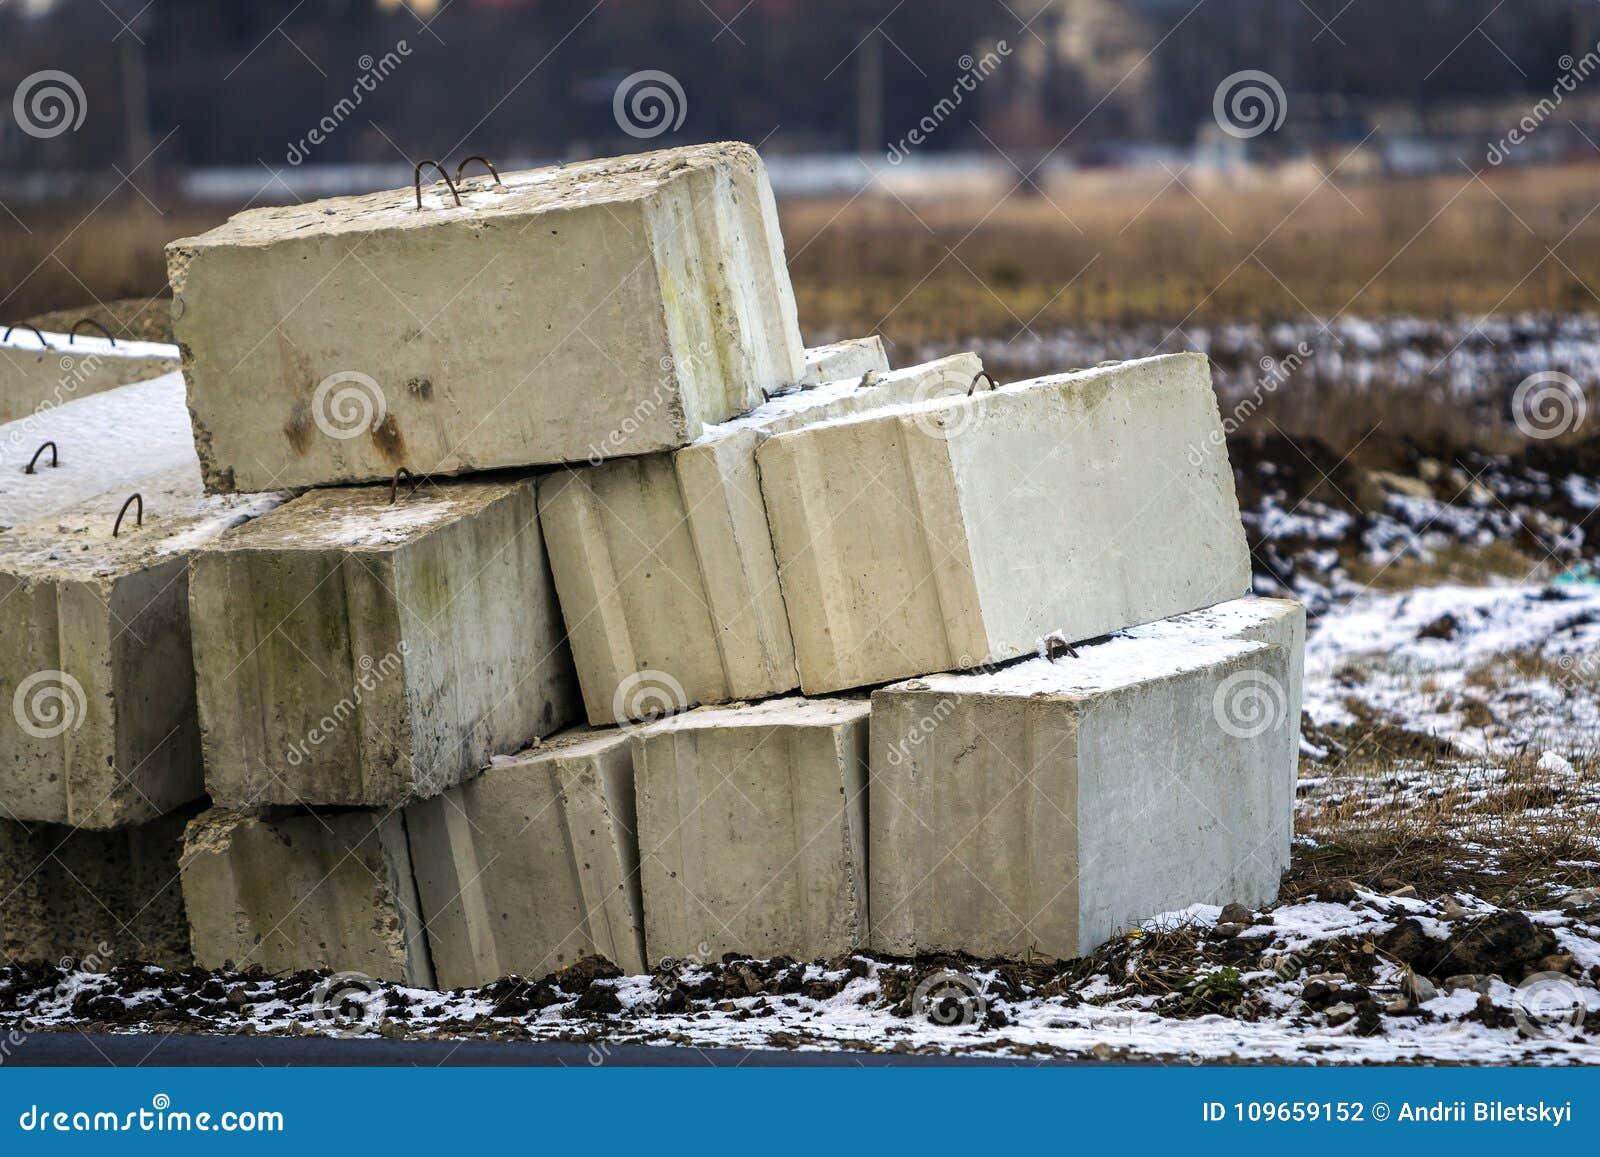 Concrete block in foundation construction 65